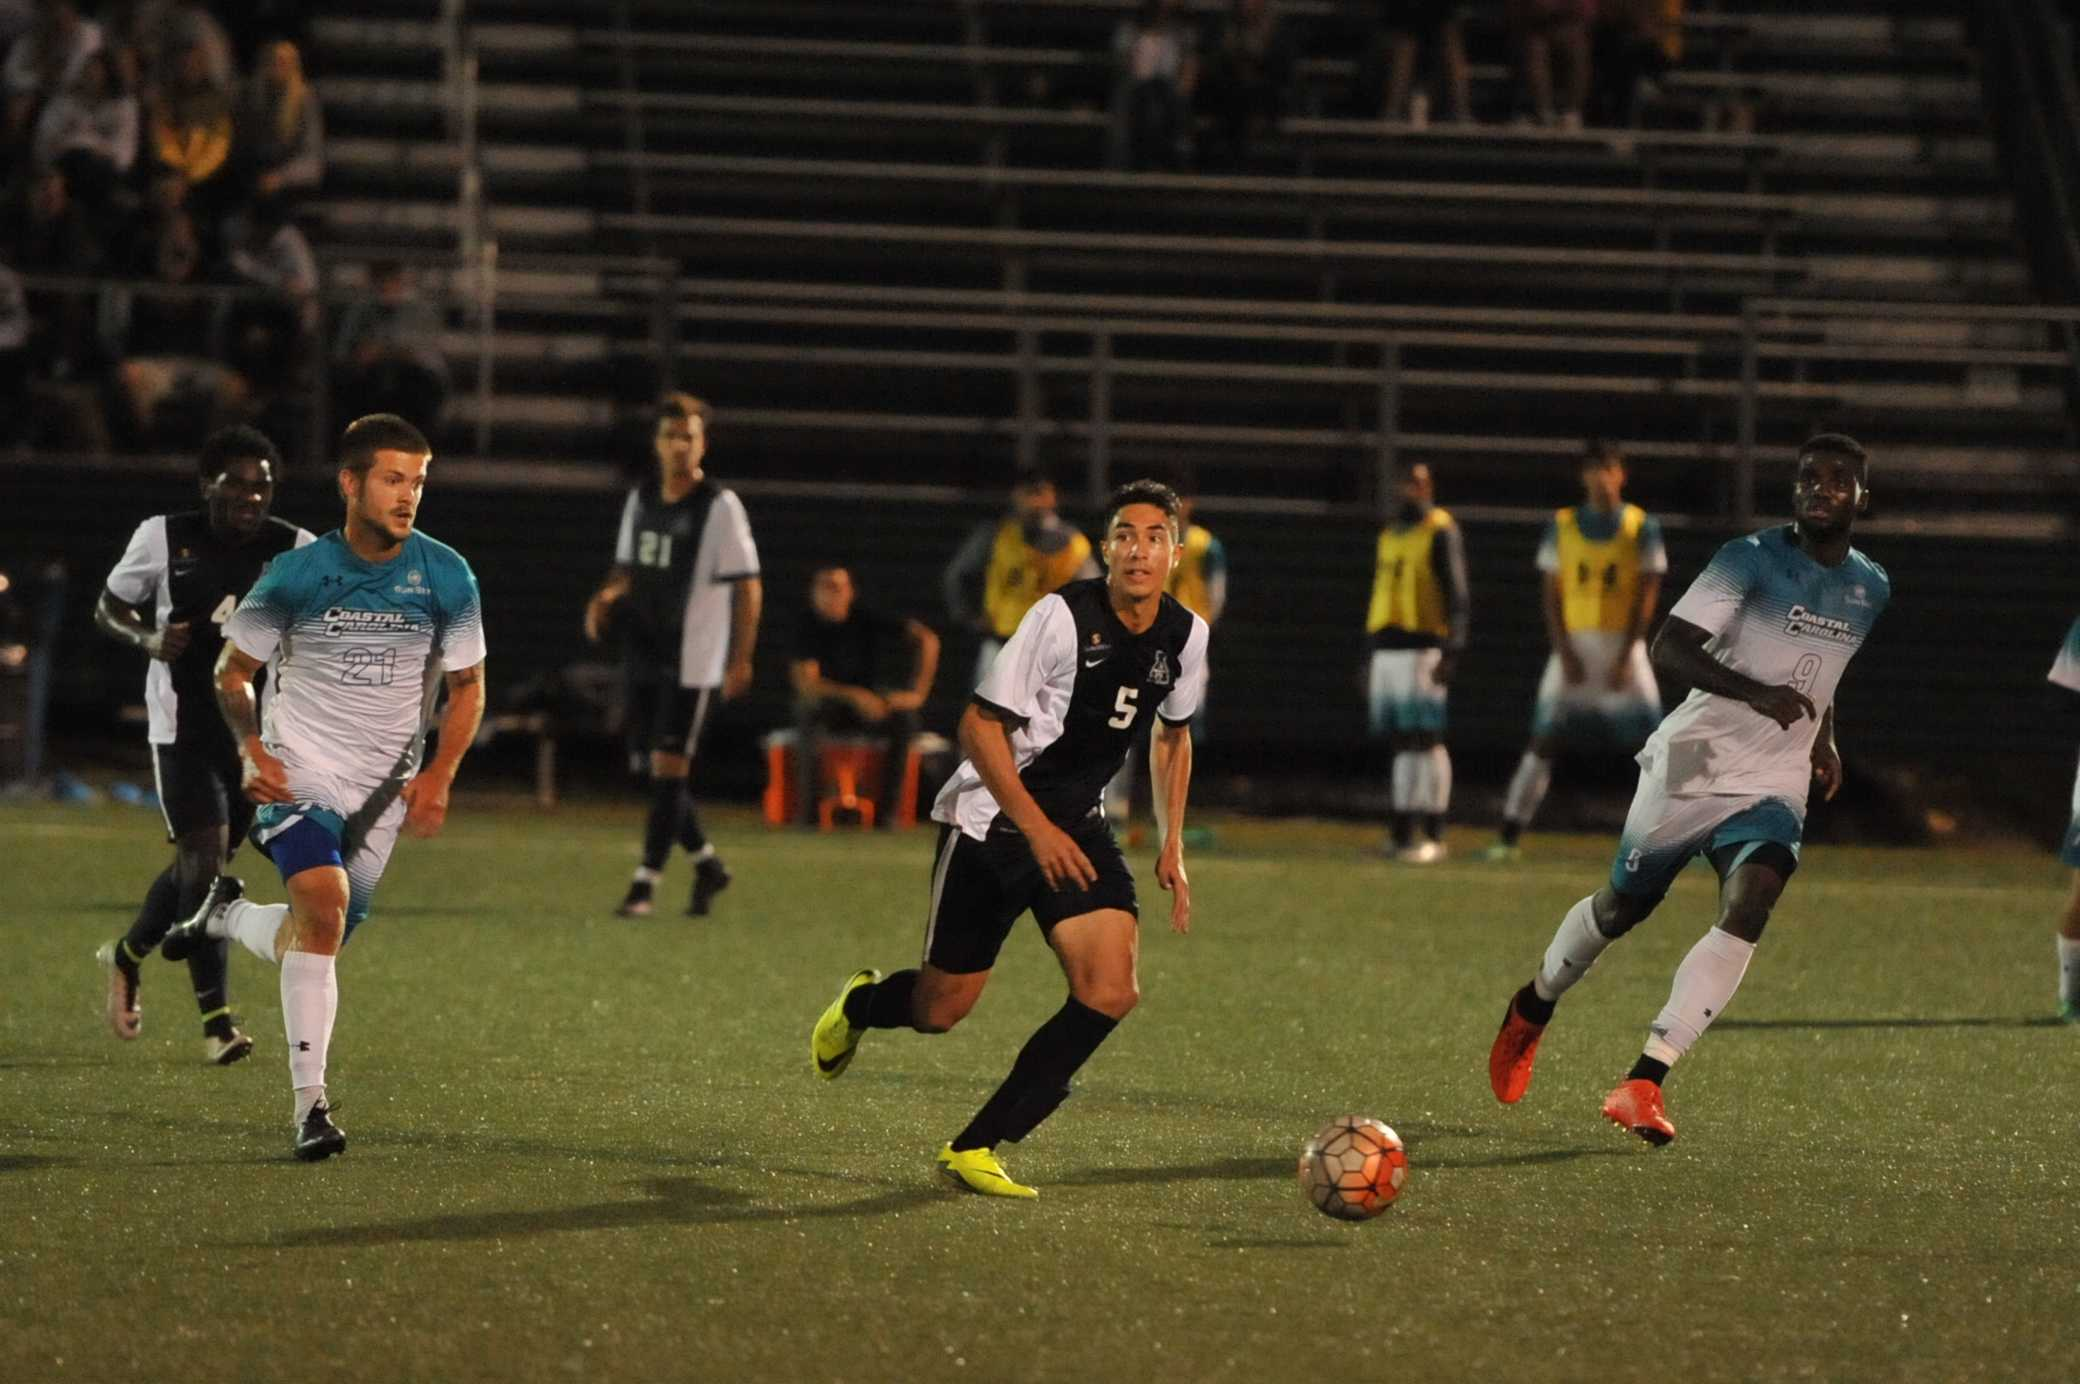 Men's soccer unbeaten streak ends in overtime